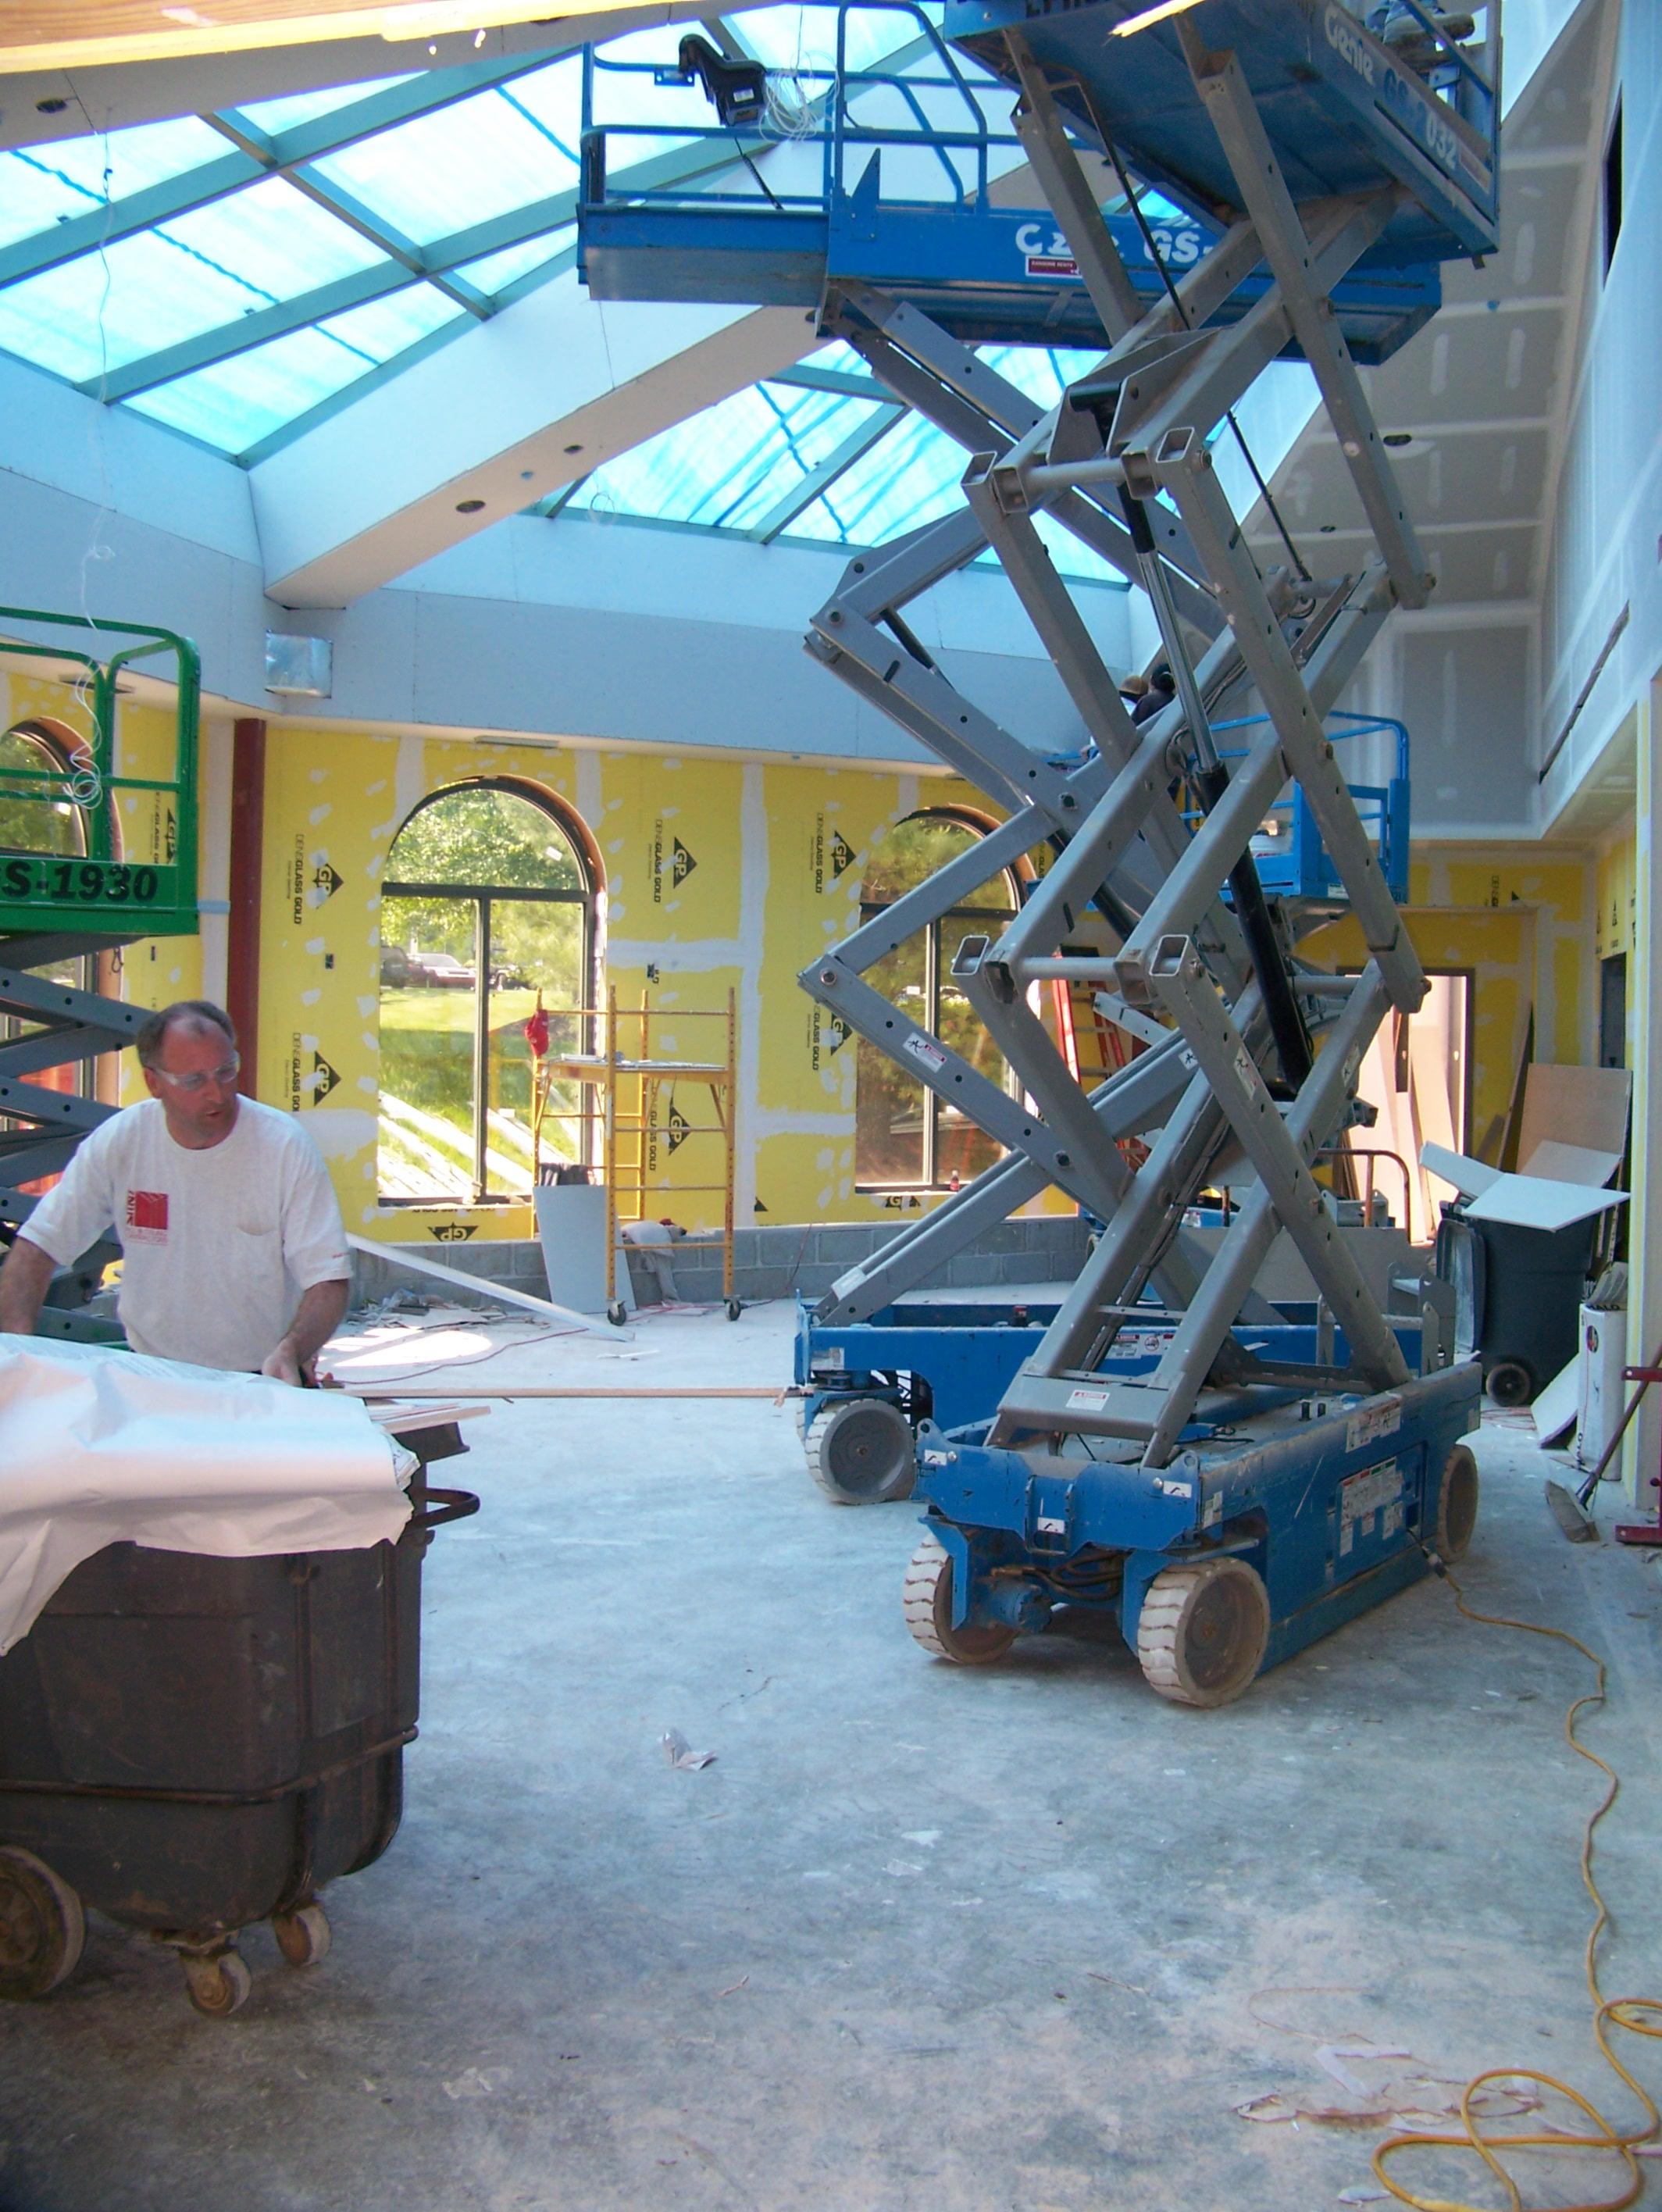 Hotel project underway